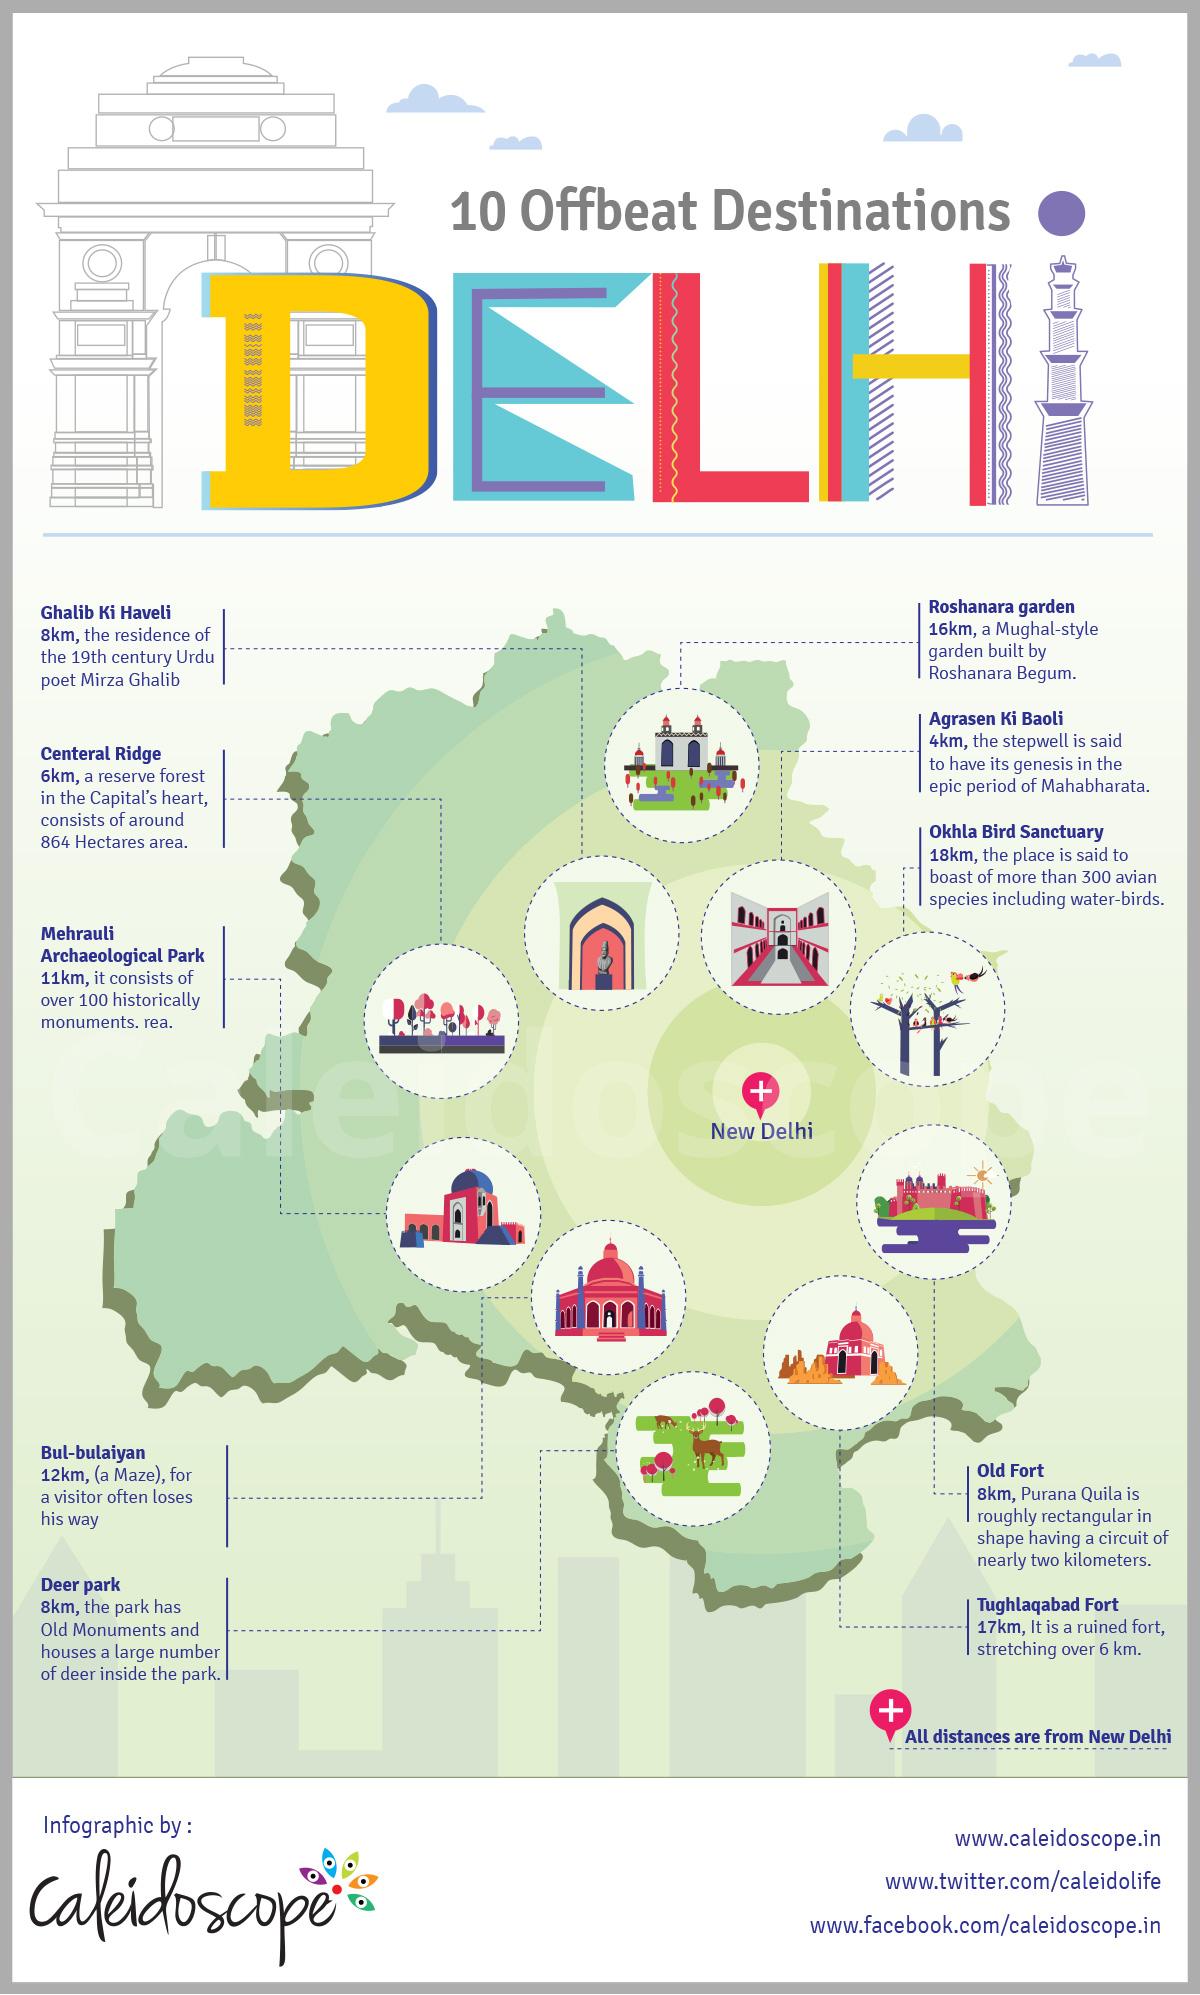 Offbeat-Destinations-in-Delhi